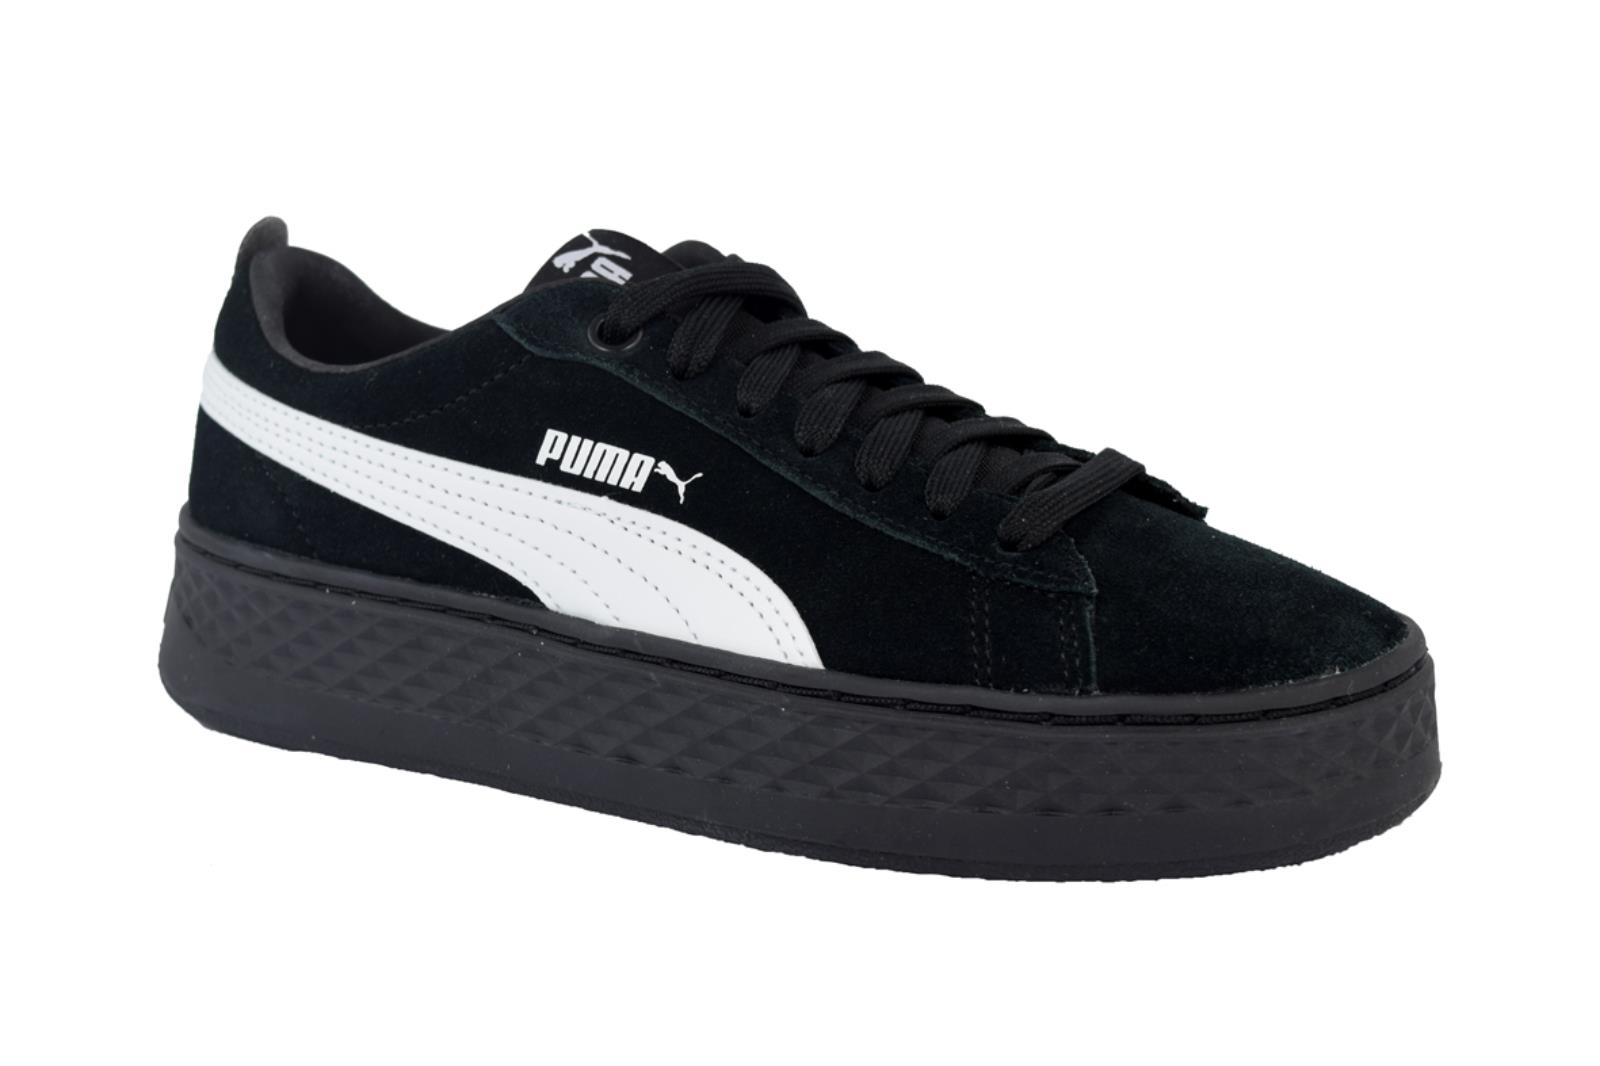 NUOVO Puma Smash Platform SD 366488 02 Donna Scarpe da Ginnastica Sneakers Sport Nero